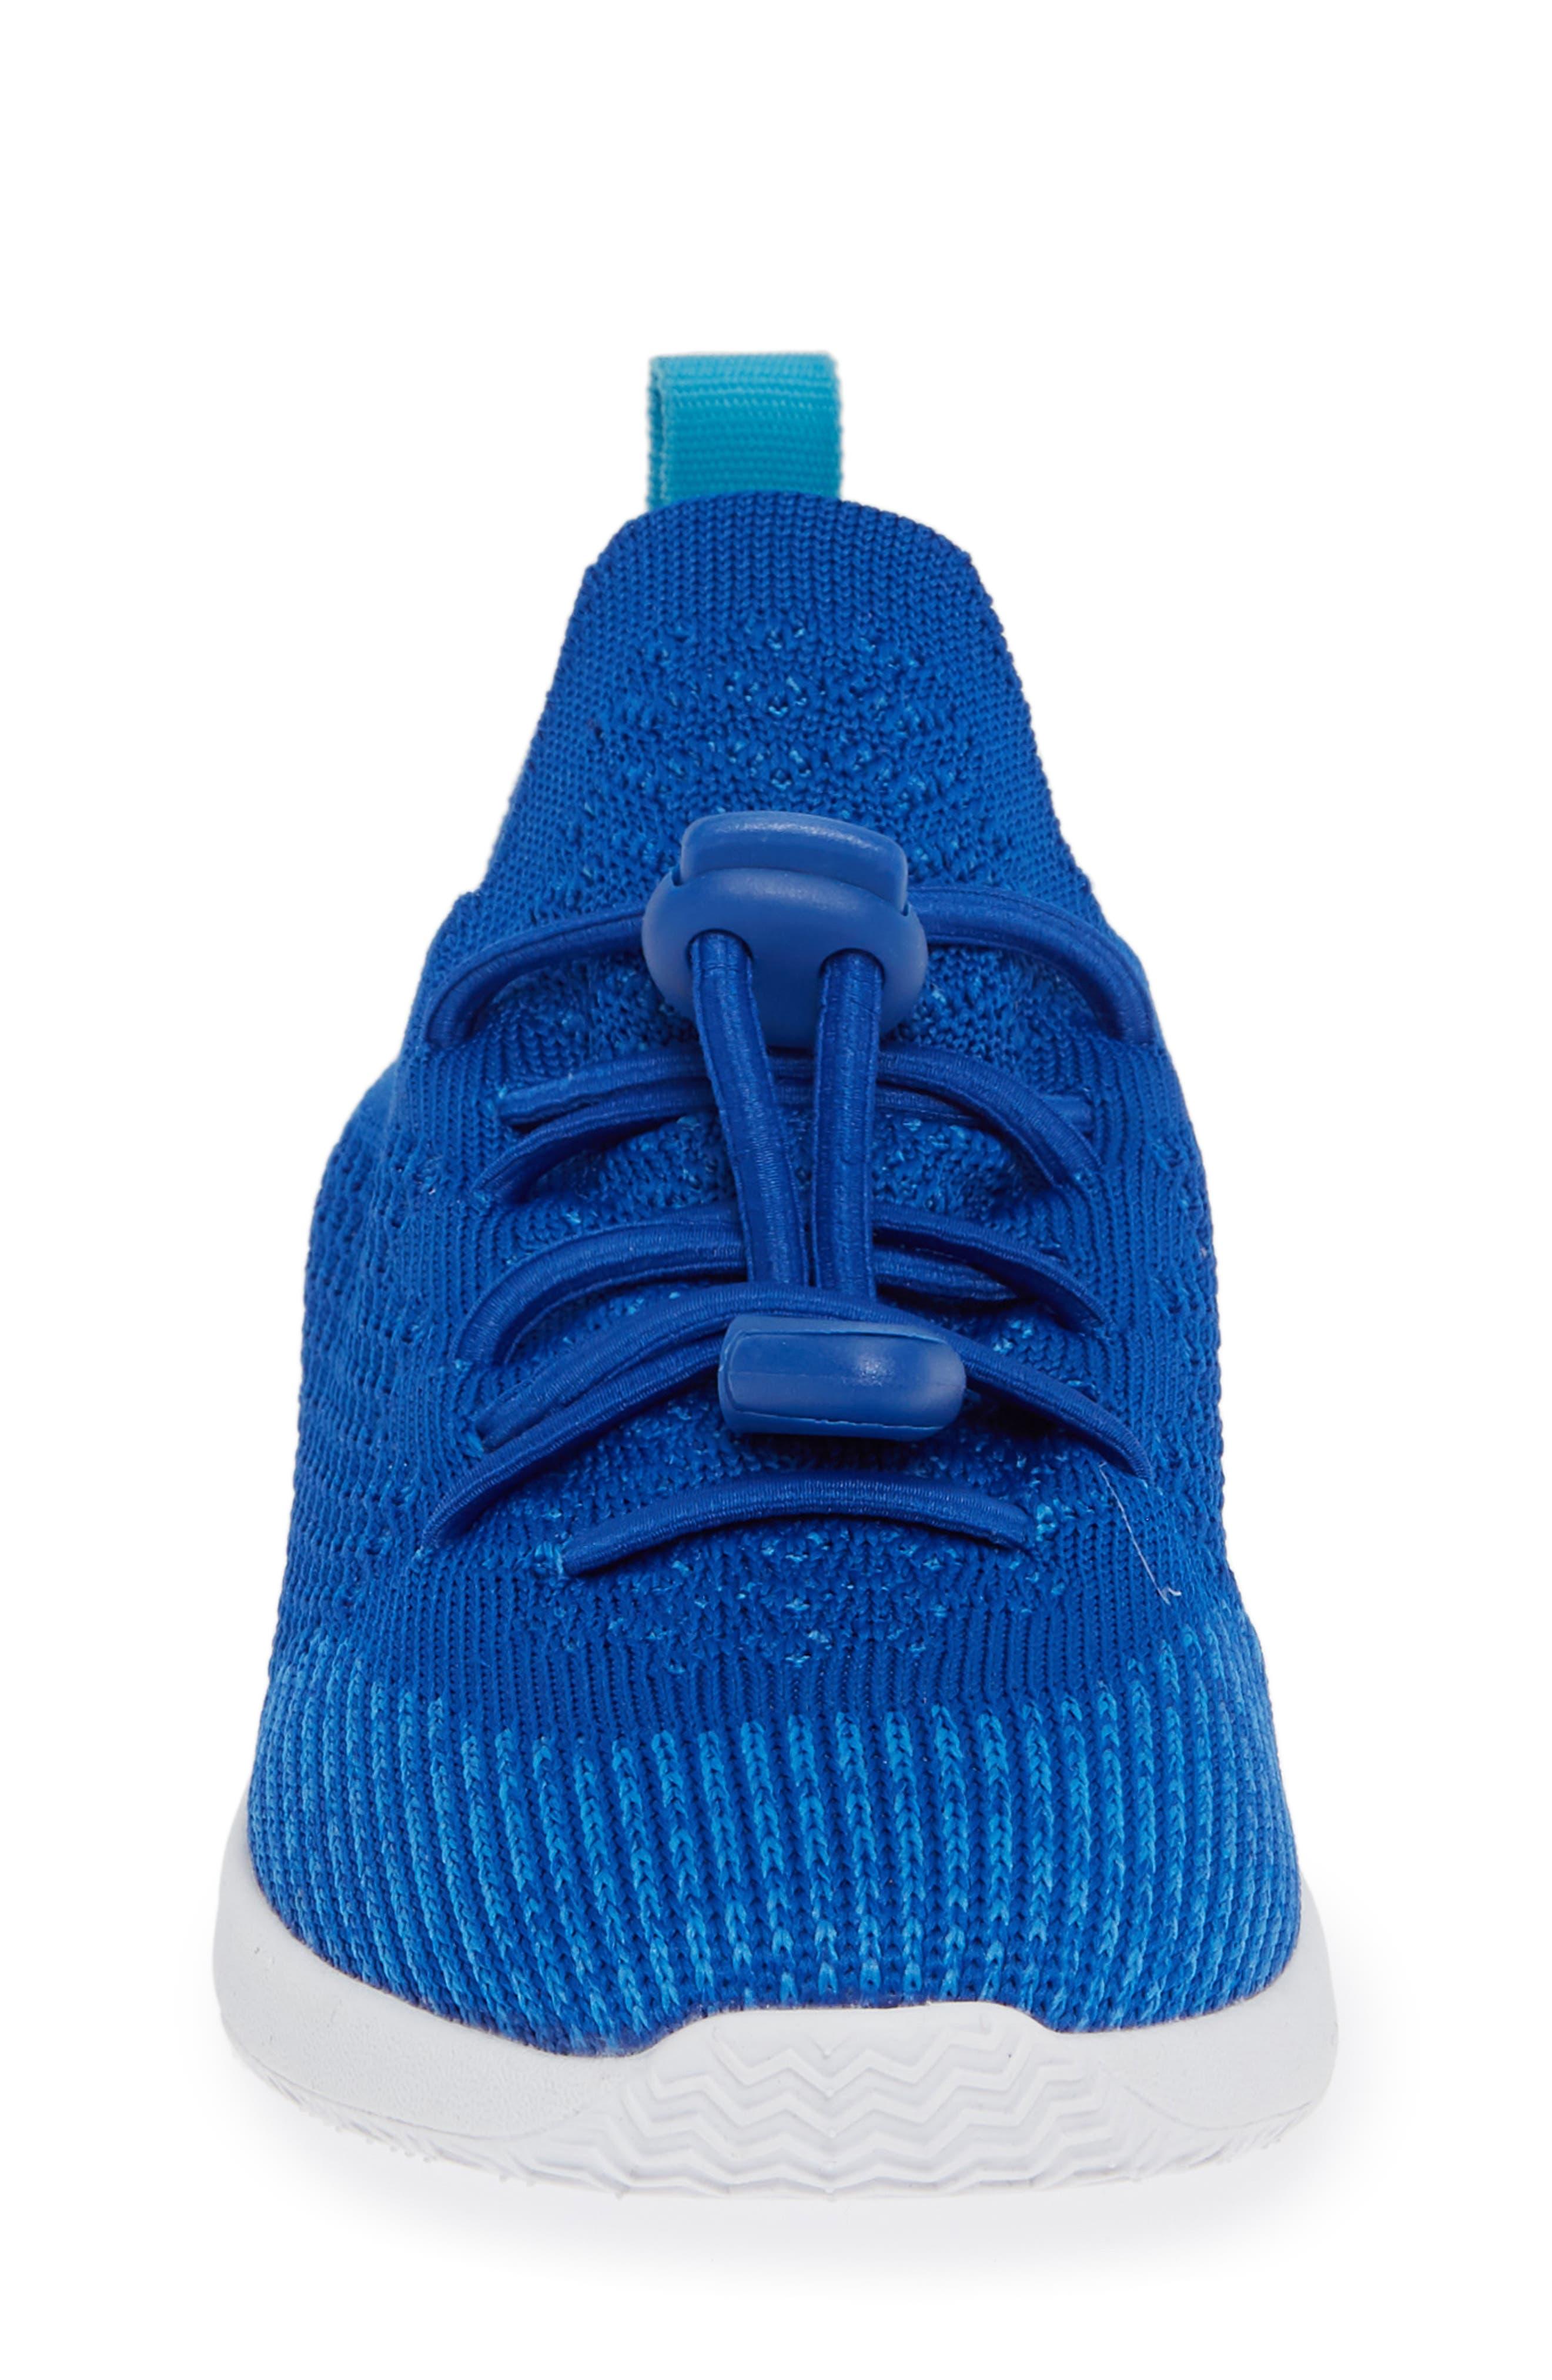 AP Mercury LiteKnit Sneaker,                             Alternate thumbnail 4, color,                             VICTORIA BLUE/ SHELL WHITE